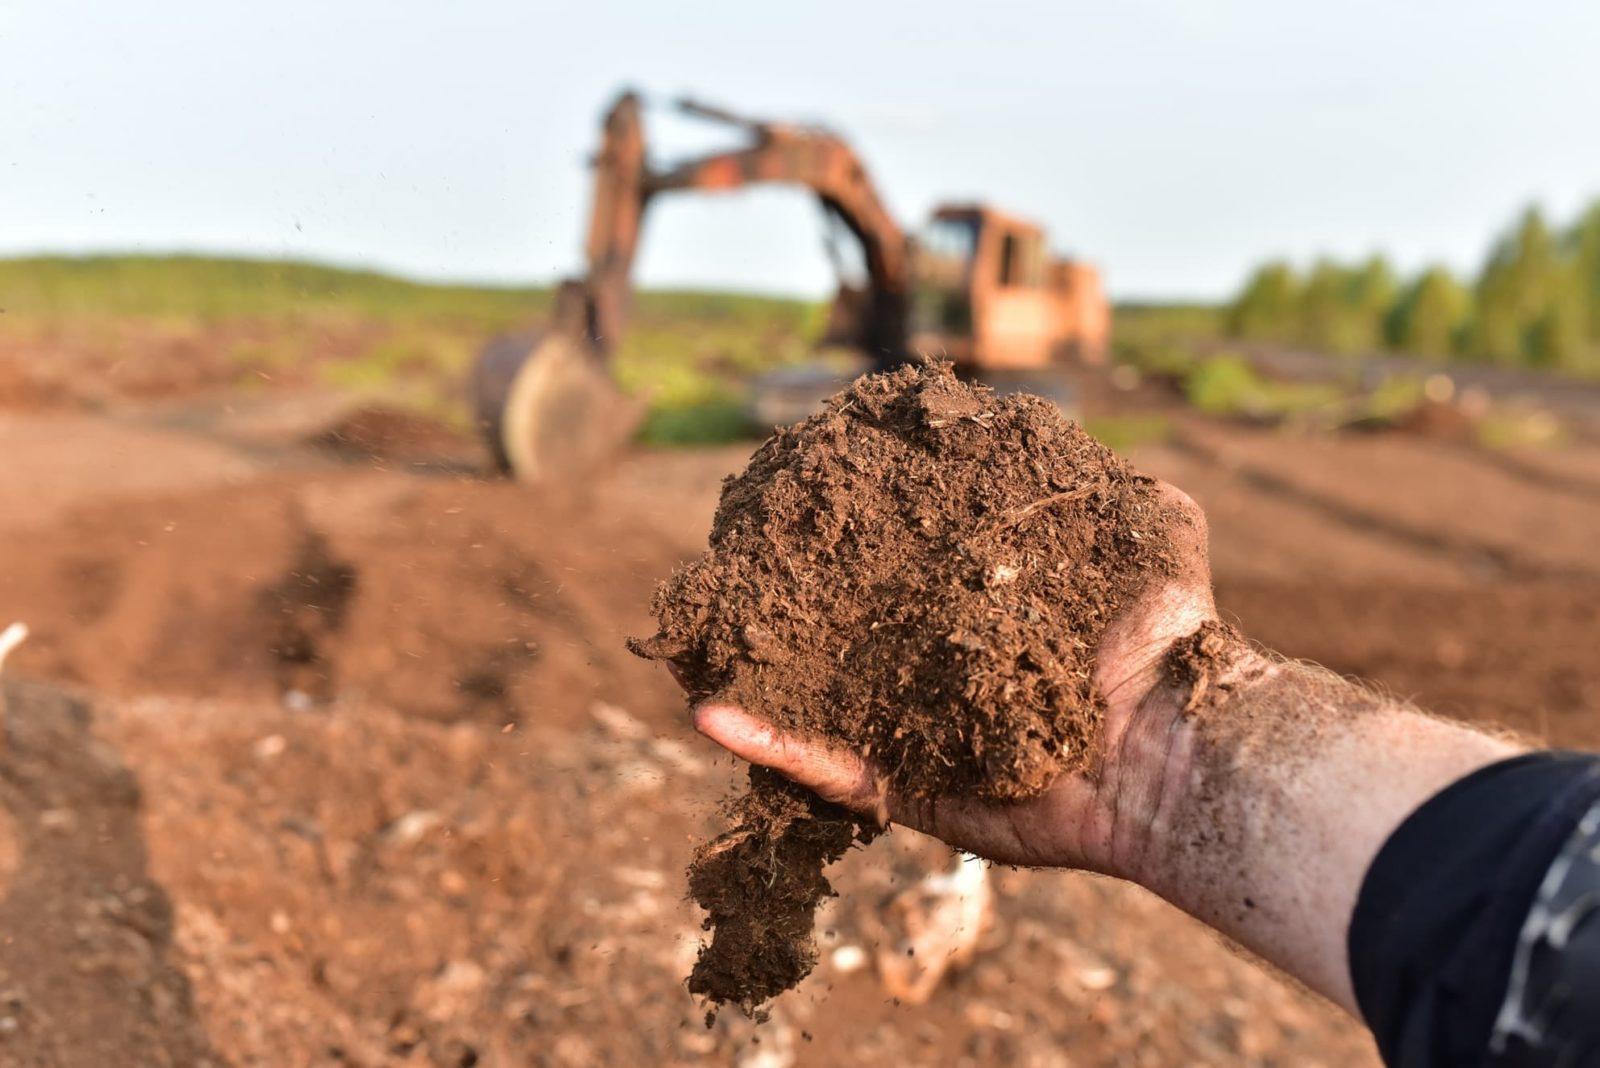 compost being harvested from peatland bog